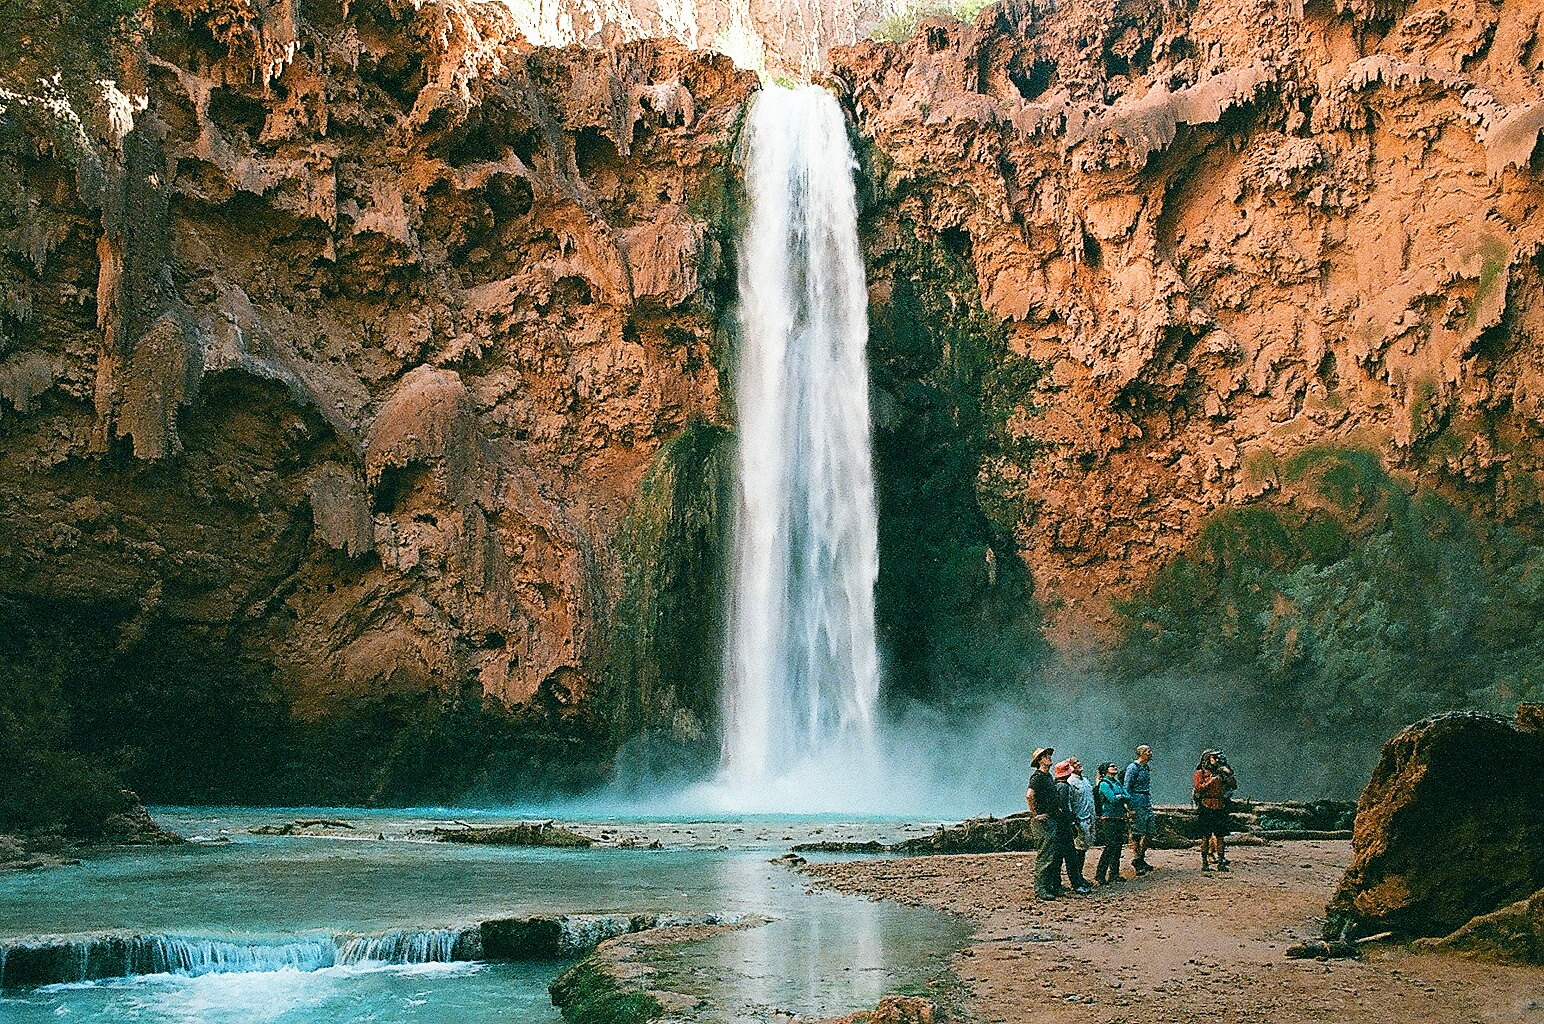 Mooney Falls, Havasupai Reservation, Arizona.